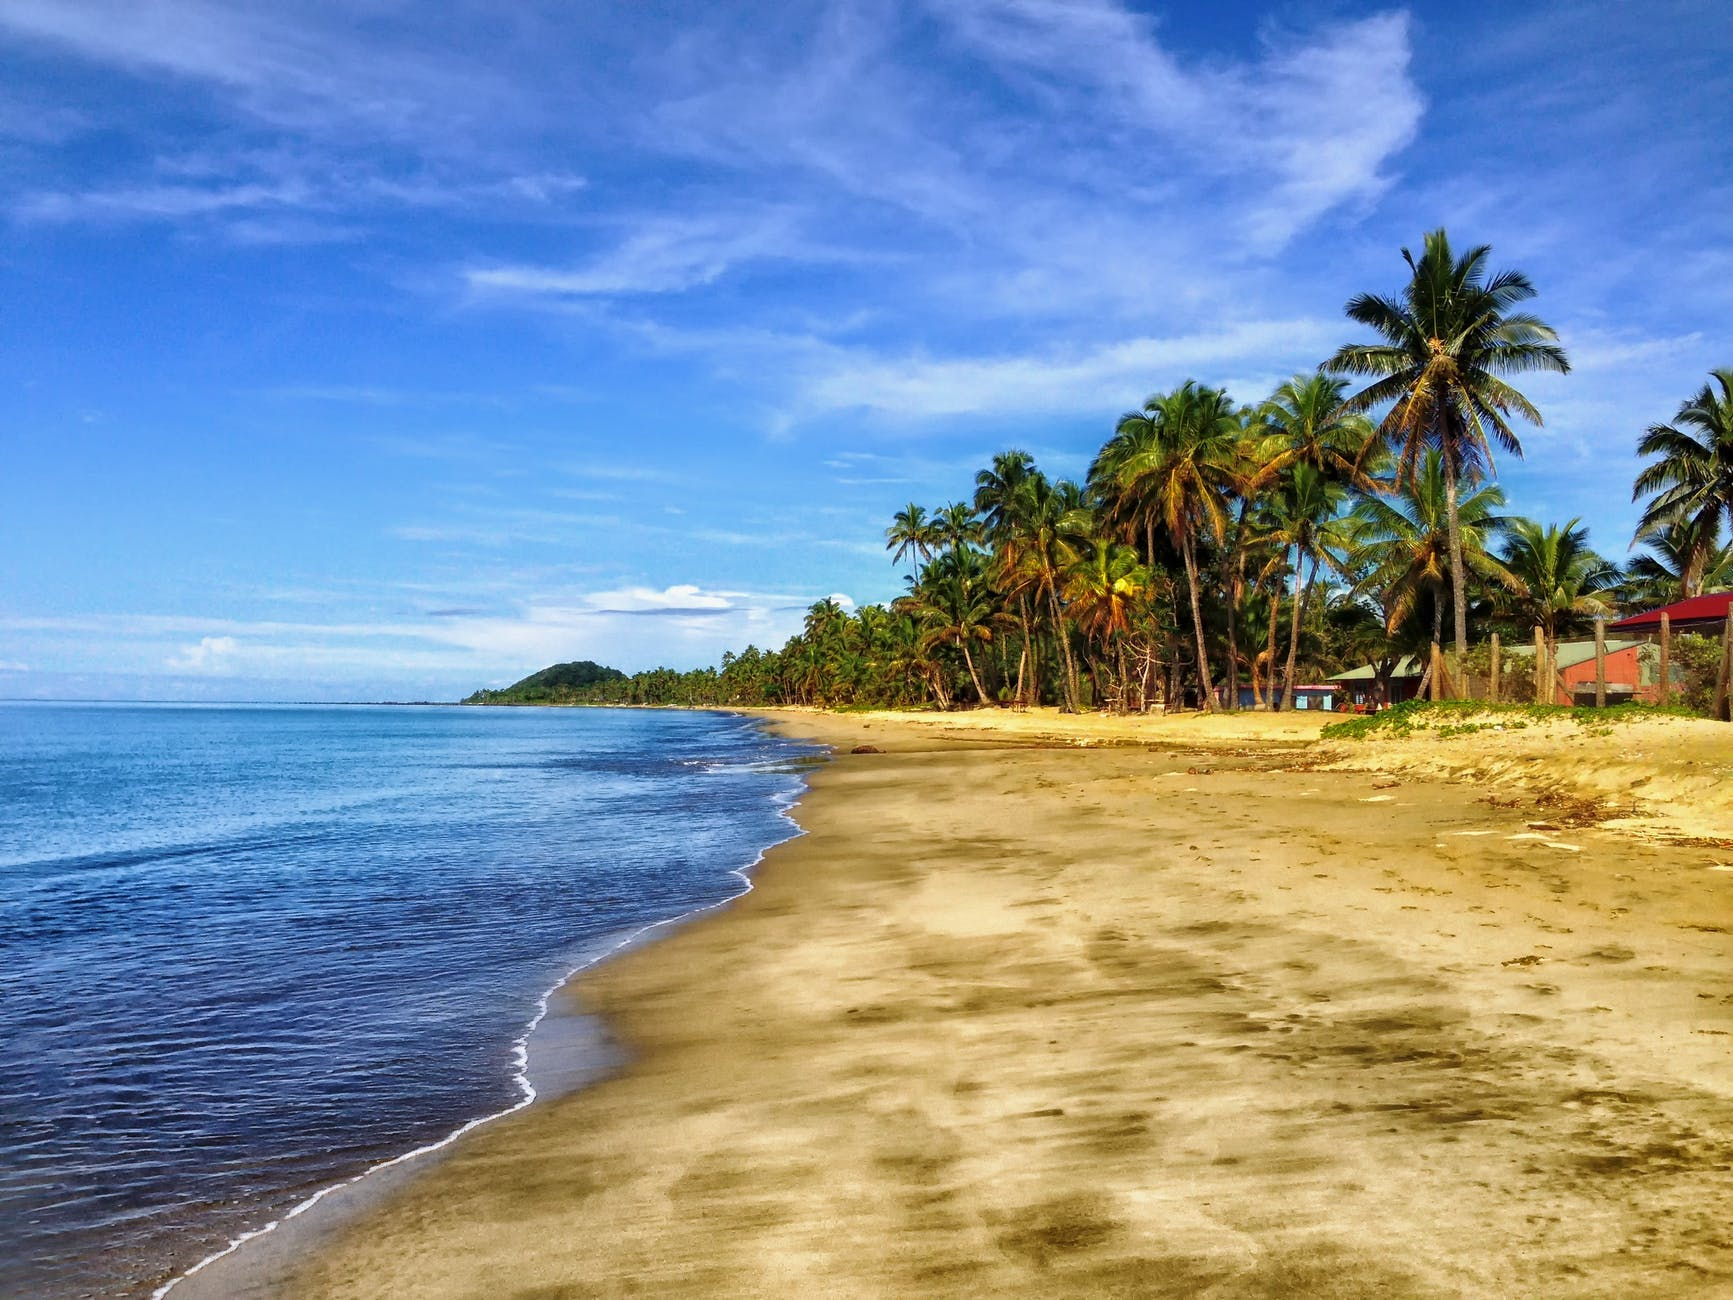 fiji-beach-sand-palm-trees-56005